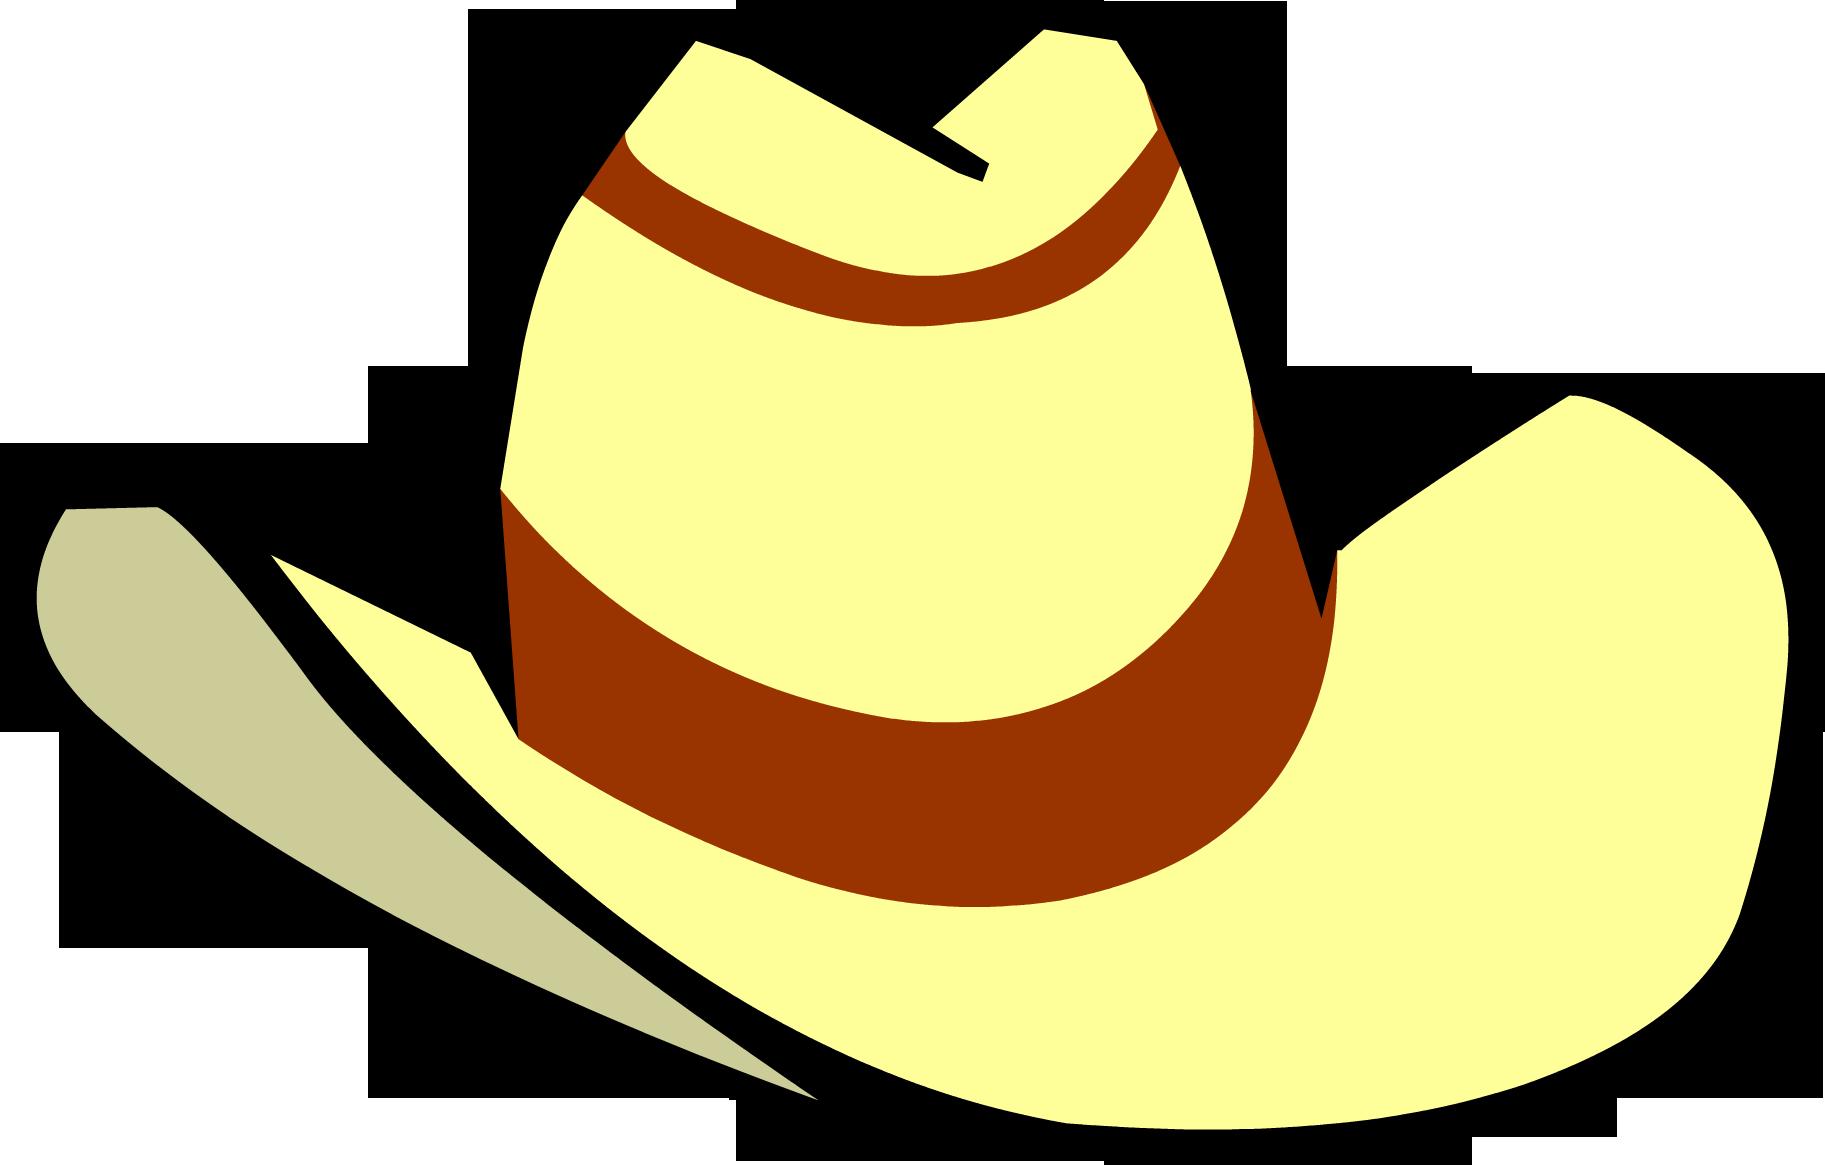 Tan Cowboy Hat   Club Penguin Wiki   FANDOM powered by Wikia